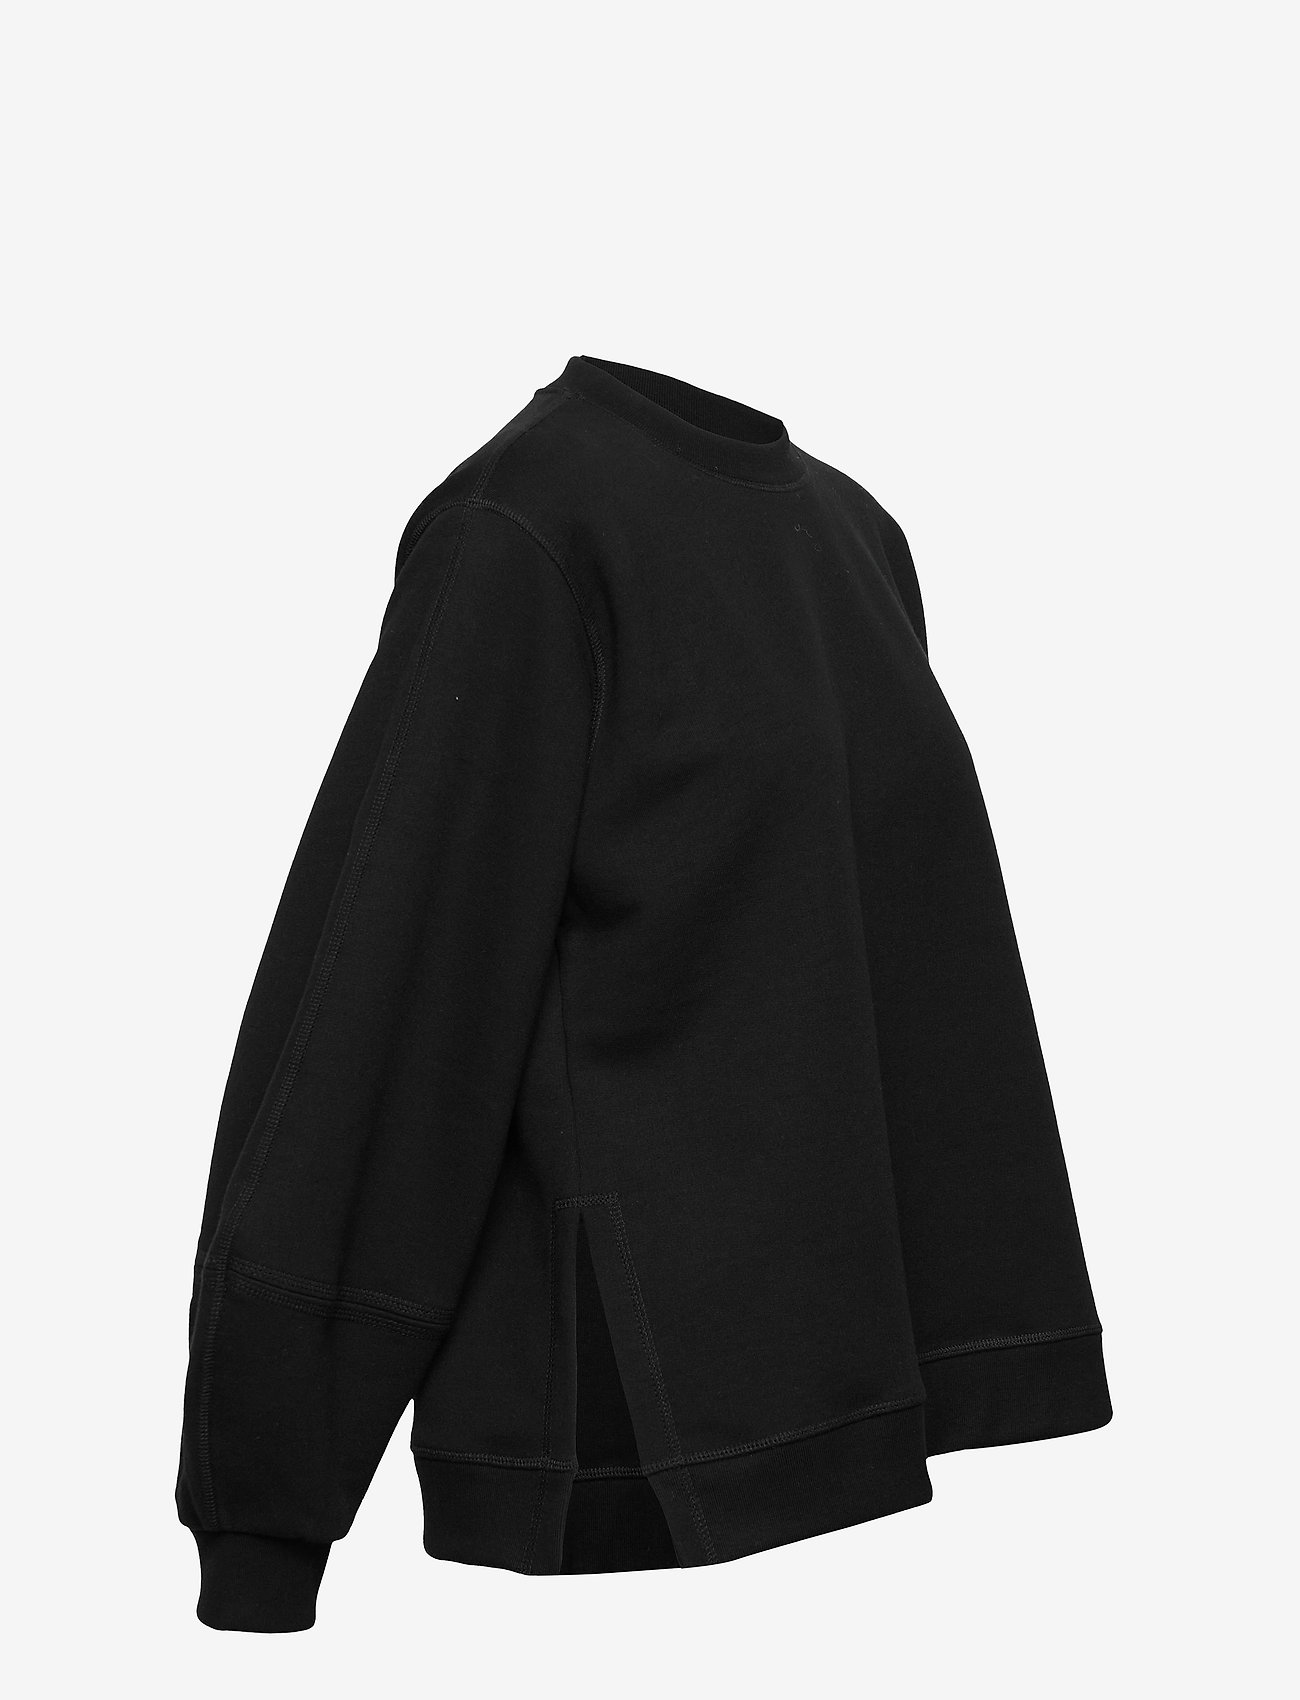 Ganni - Software Isoli - sweatshirts & hoodies - black - 3